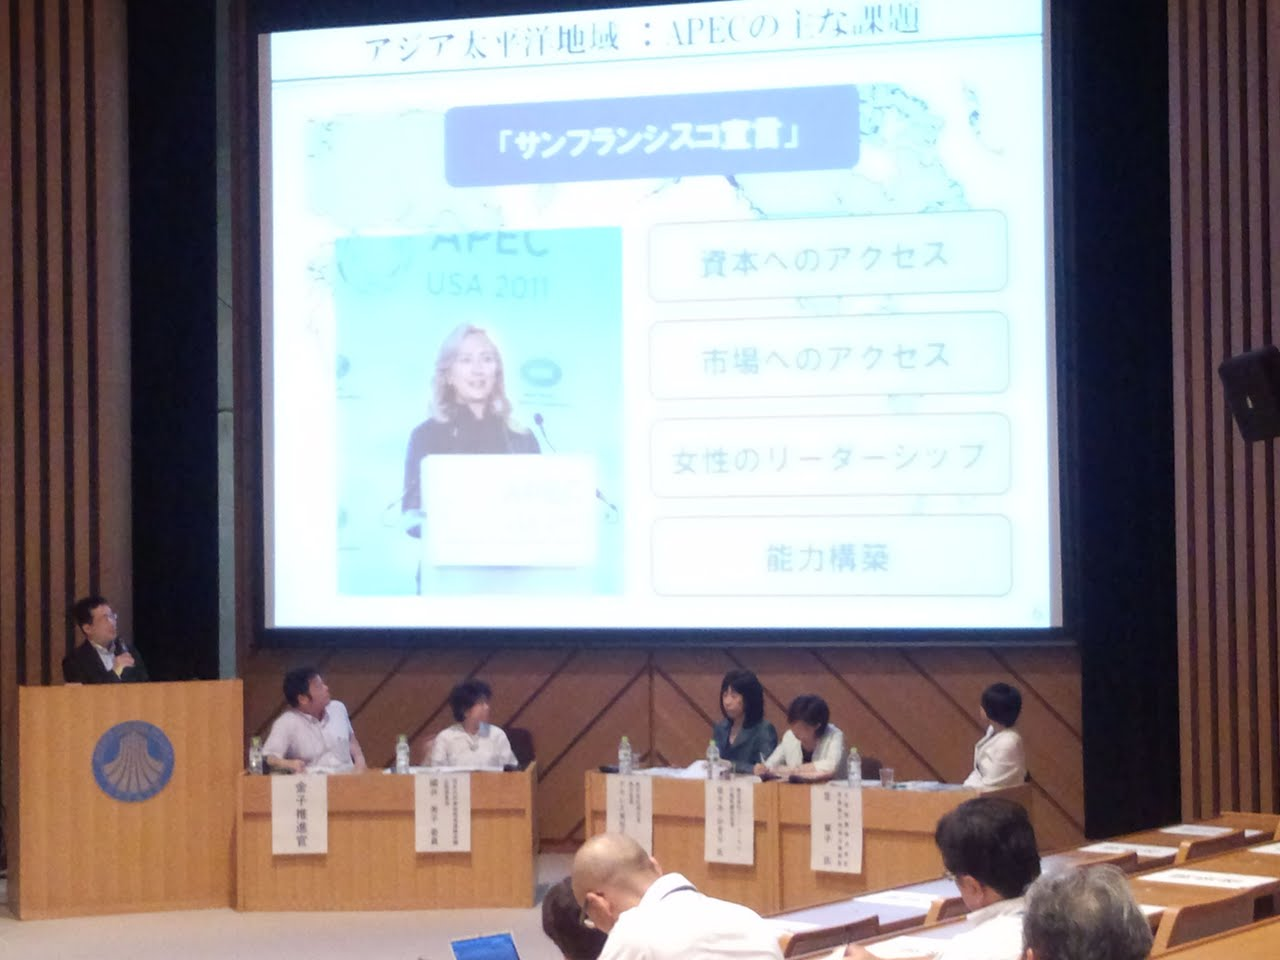 APEC女性と経済フォーラム及びリオ+20(環境と女性)について聞く会_e0123104_654495.jpg